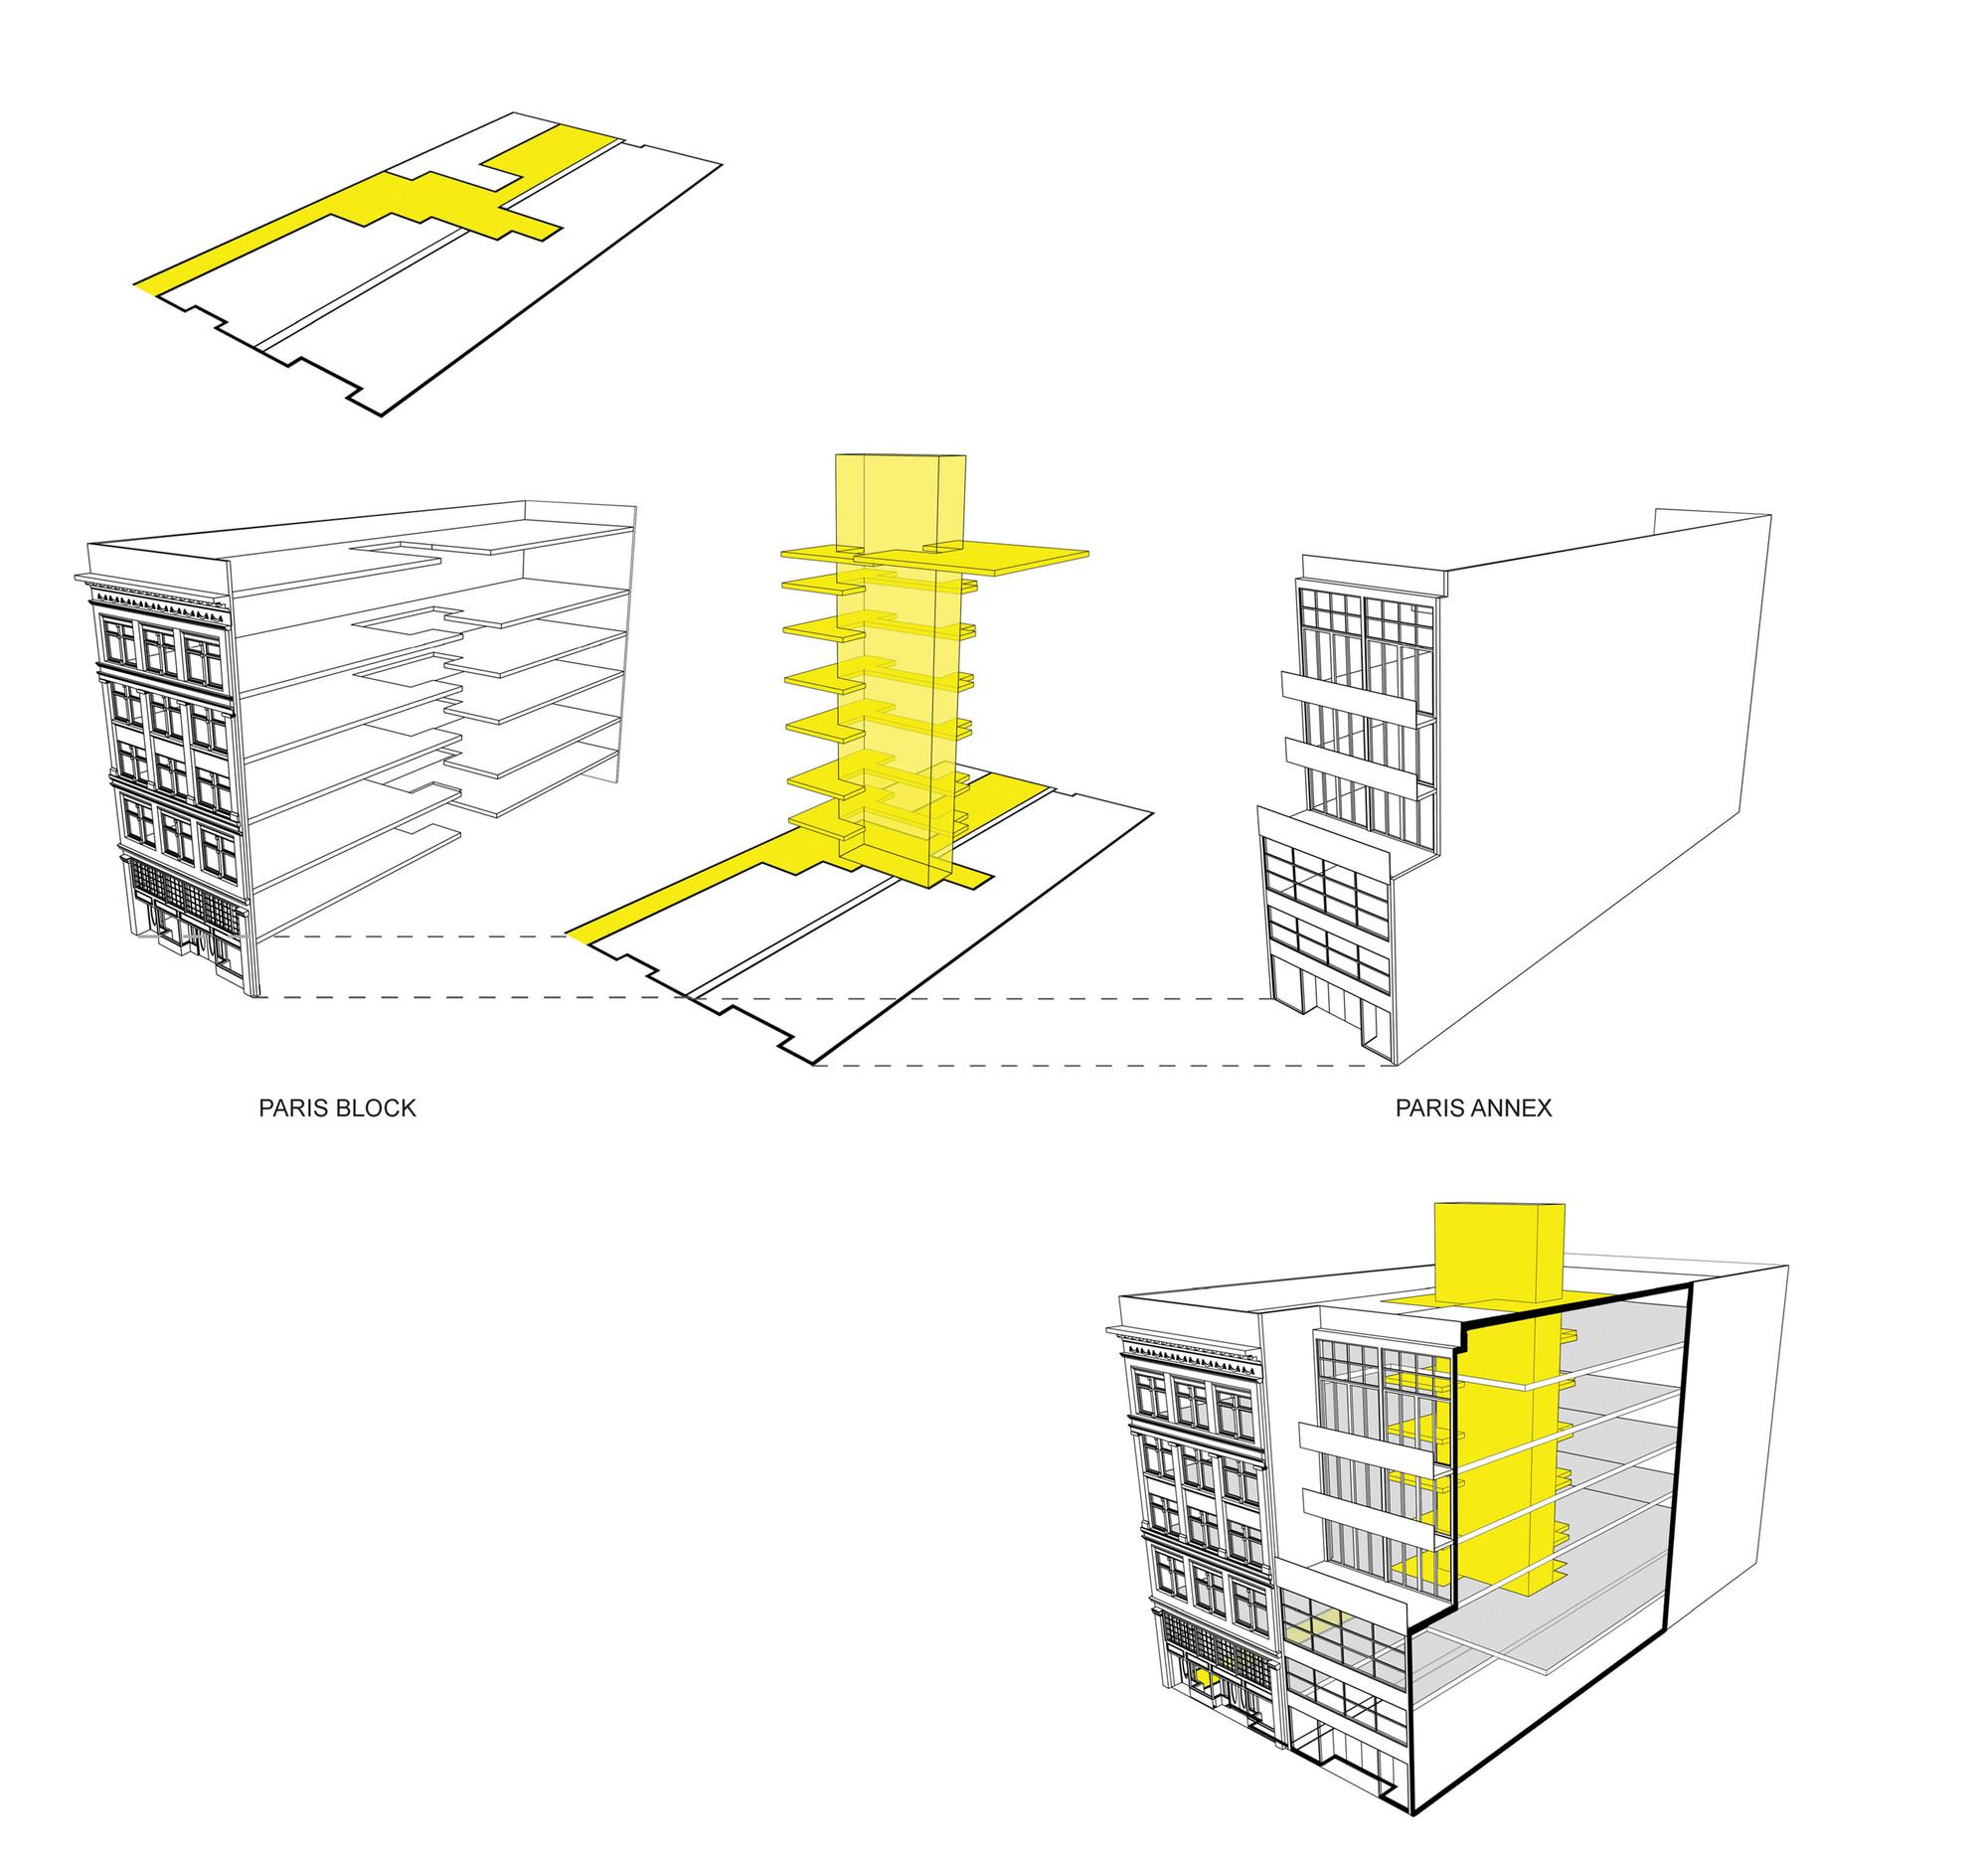 Gallery Of Paris Block Paris Annex    Gair Williamson Architect   Ankenman Marchand Architects